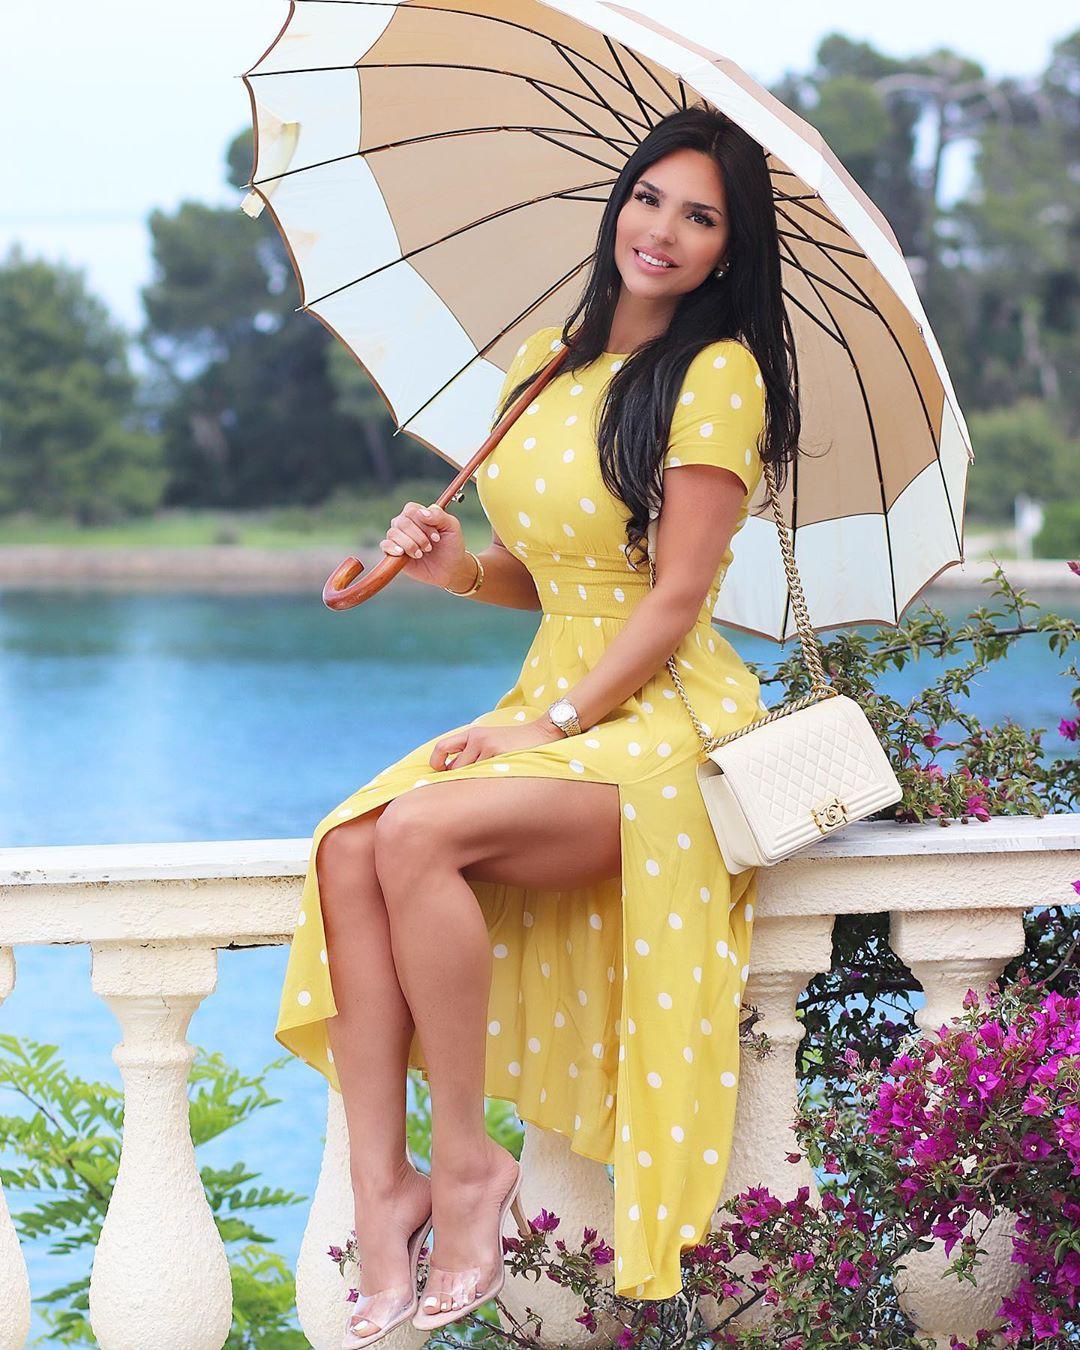 Shadi Y Cair girls photoshoot, umbrella, apparel ideas